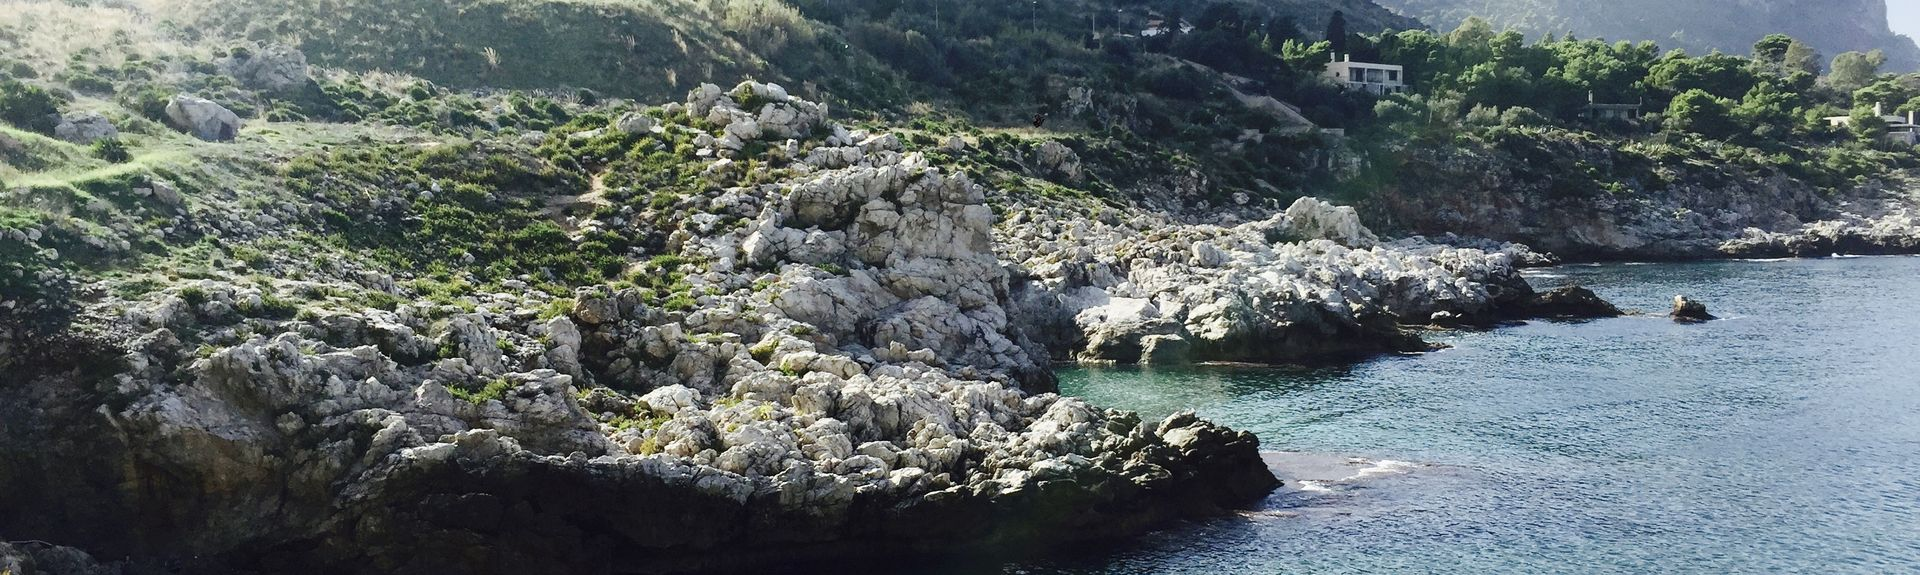 Termini Imerese, Sicilië, Italië